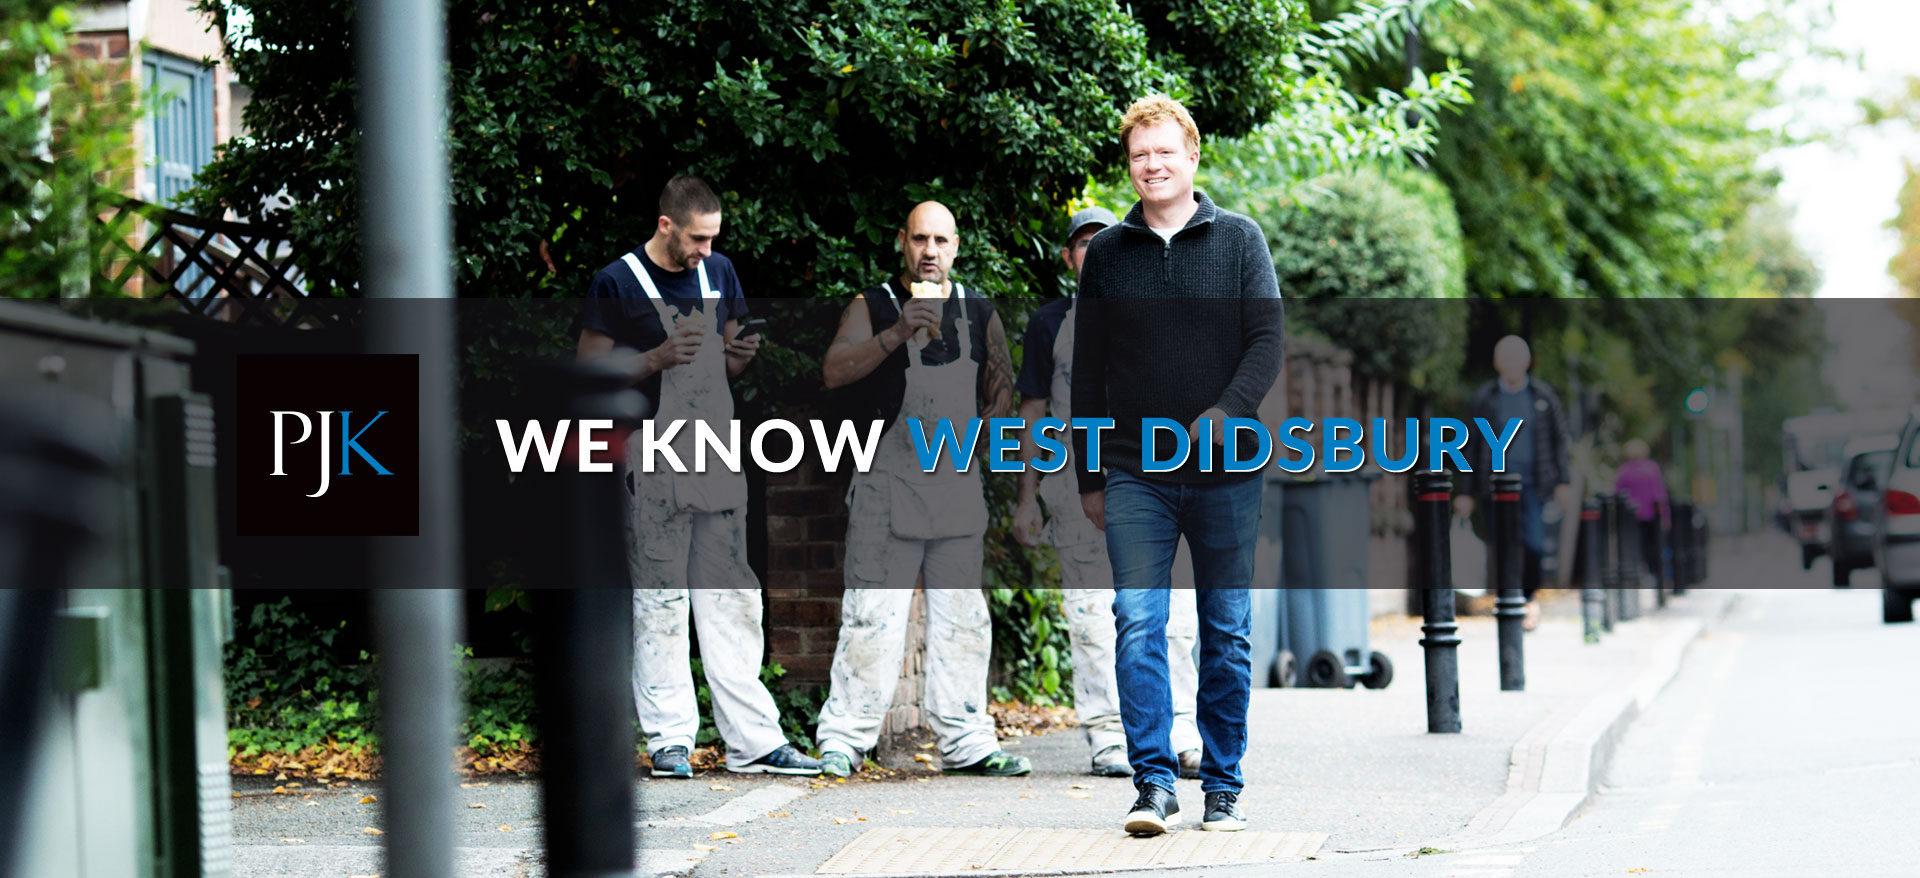 We know West Didsbury